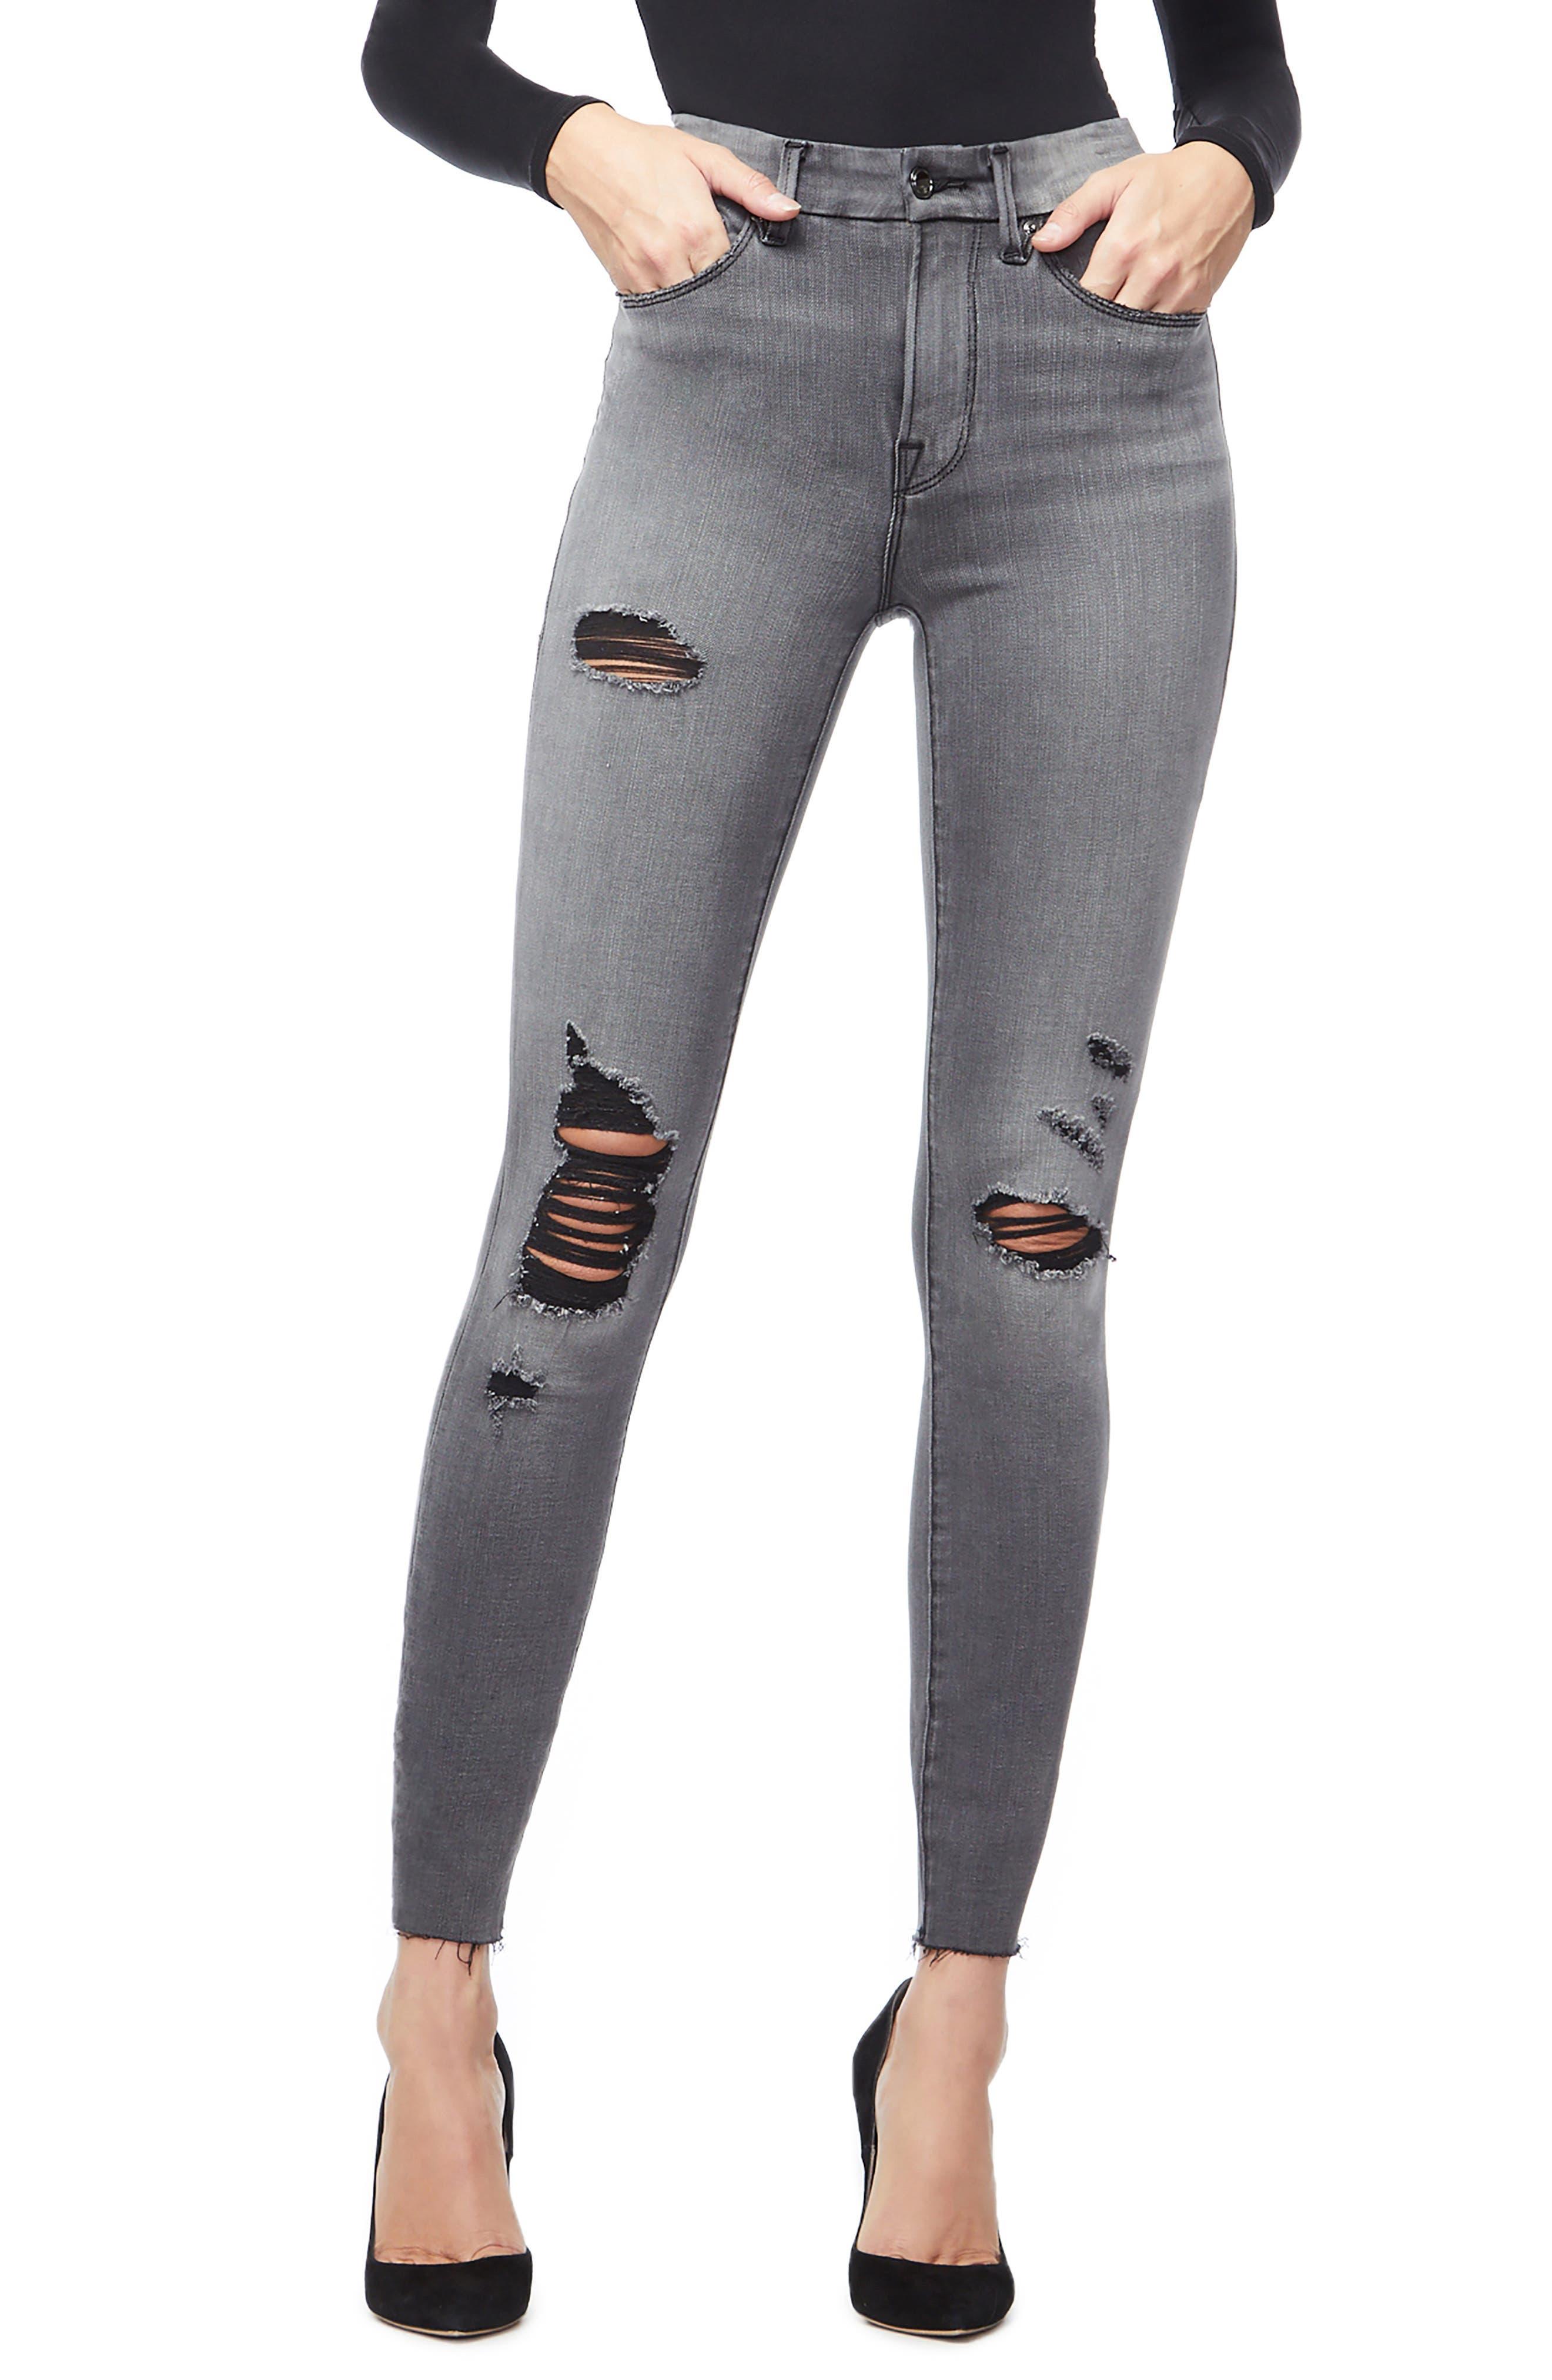 GOOD AMERICAN, Good Waist Ripped High Waist Skinny Jeans, Main thumbnail 1, color, BLACK044